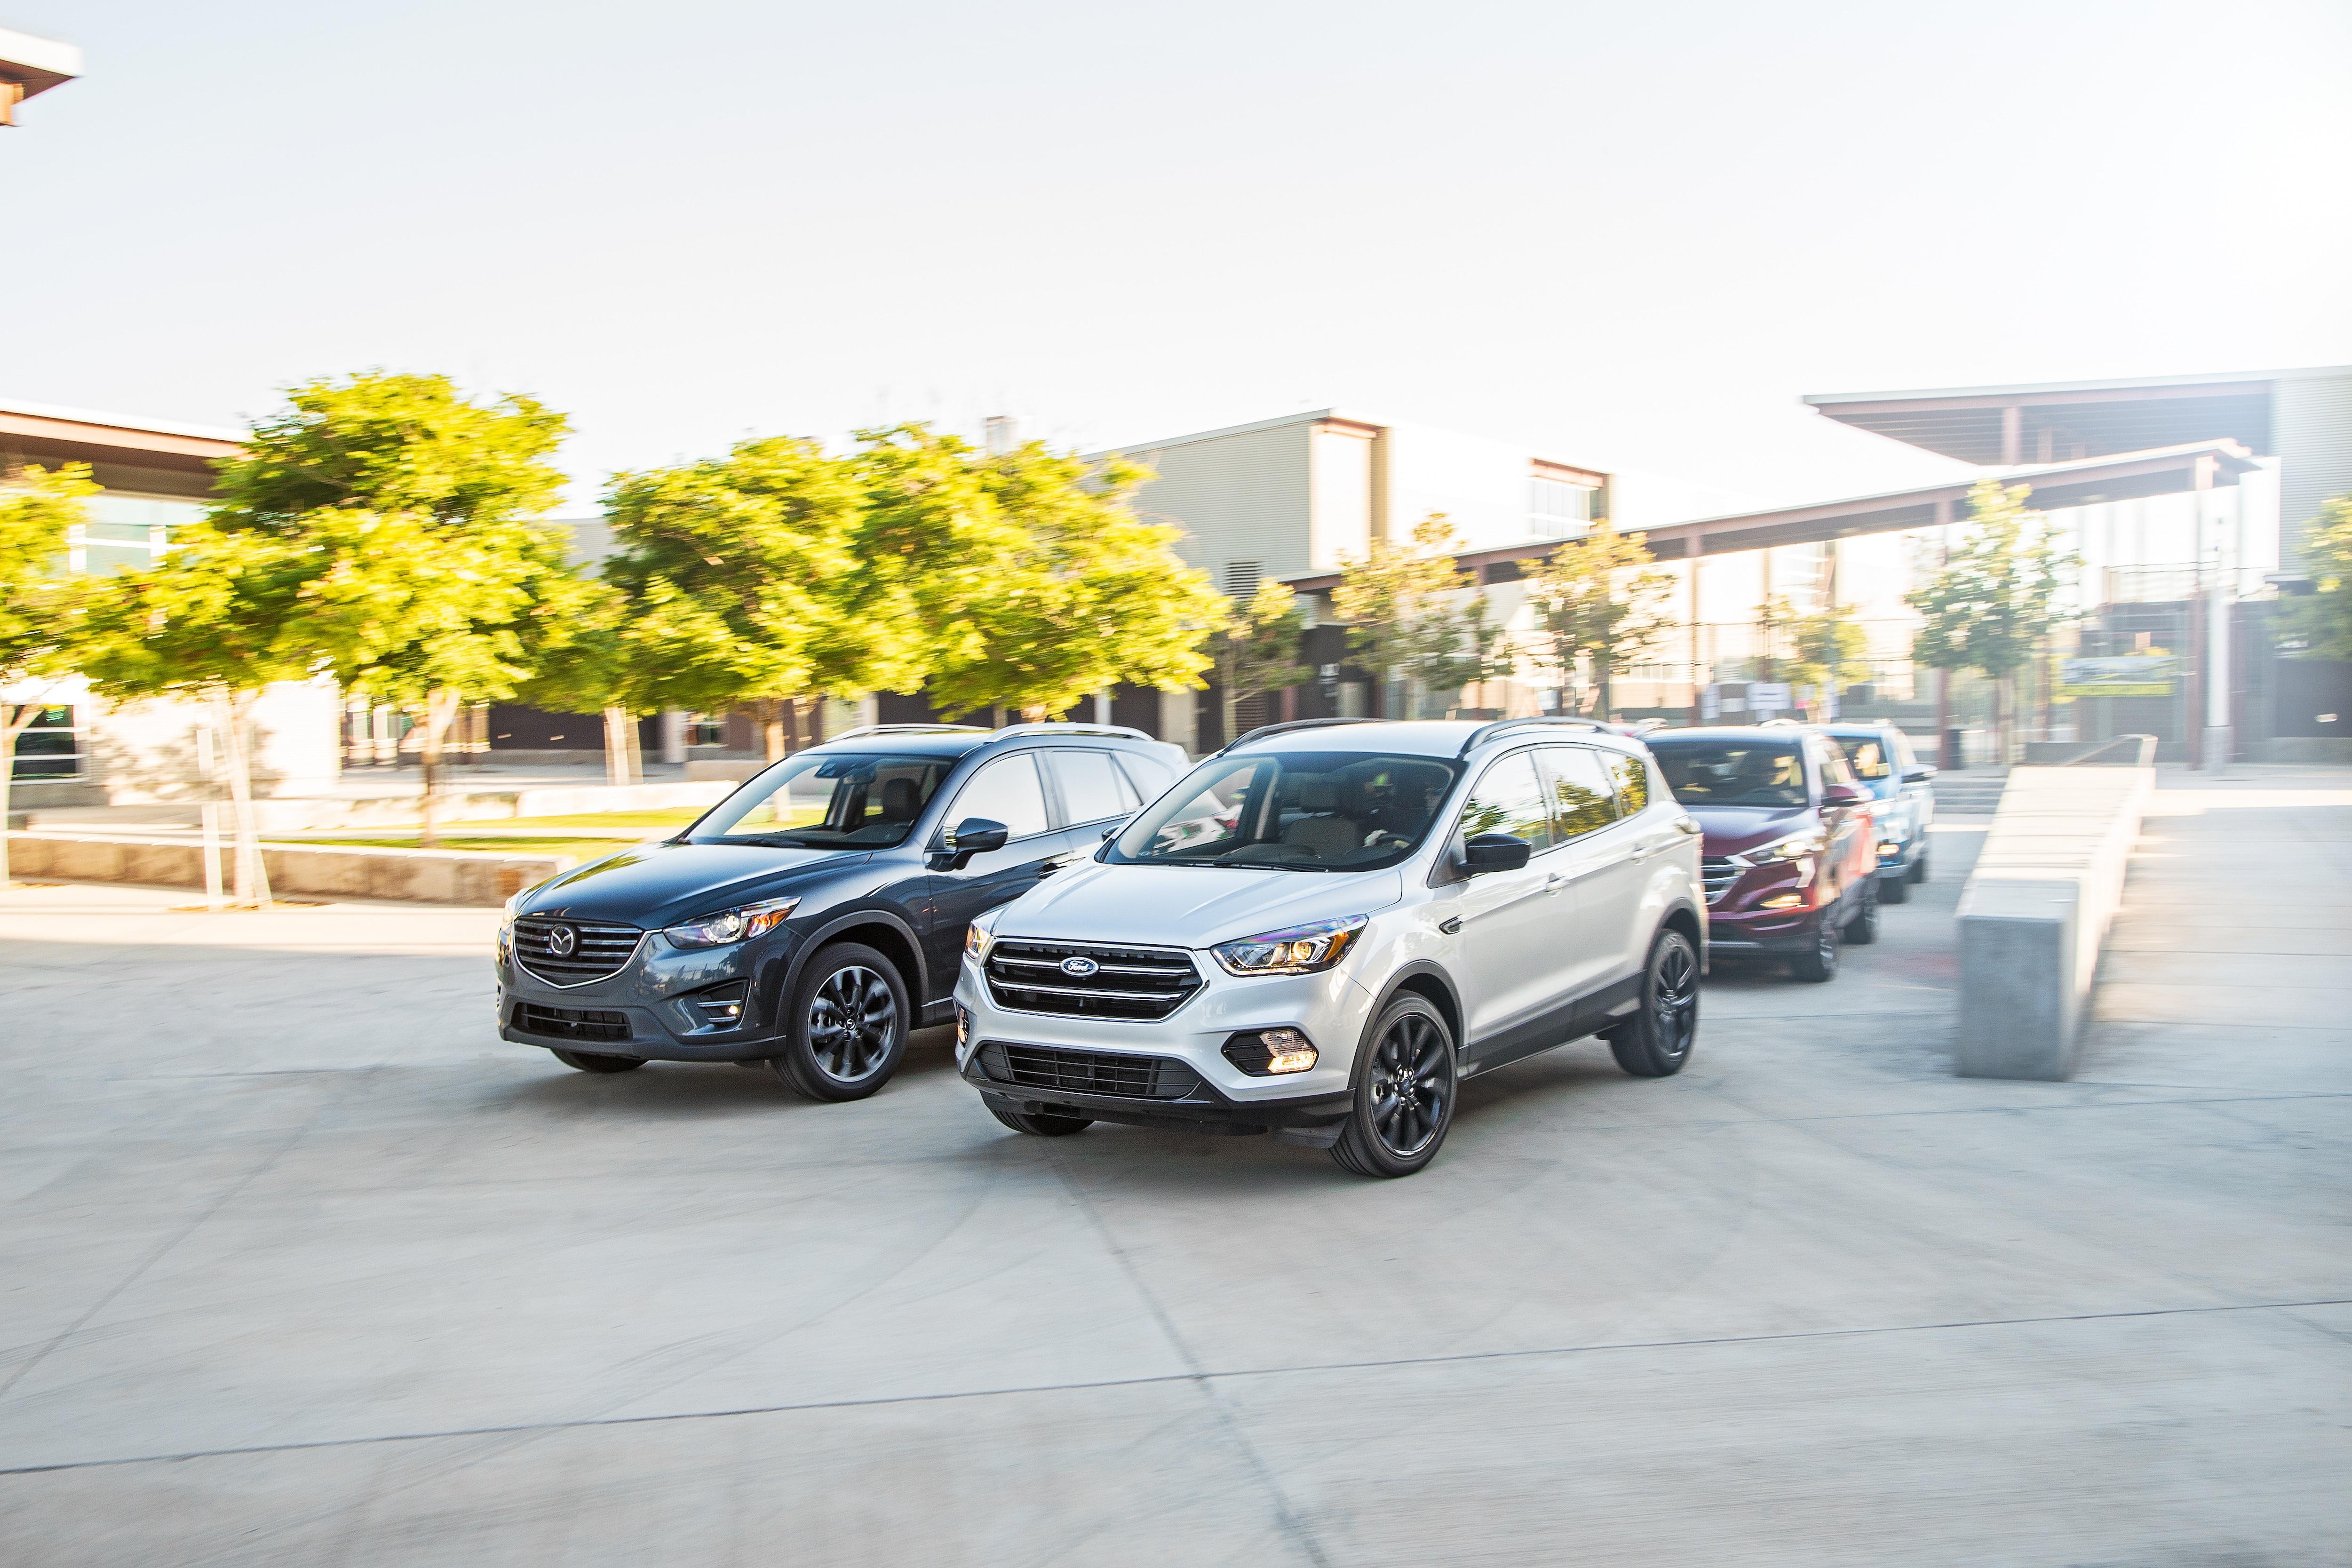 2016 2017 Crossover SUVs front three quarter